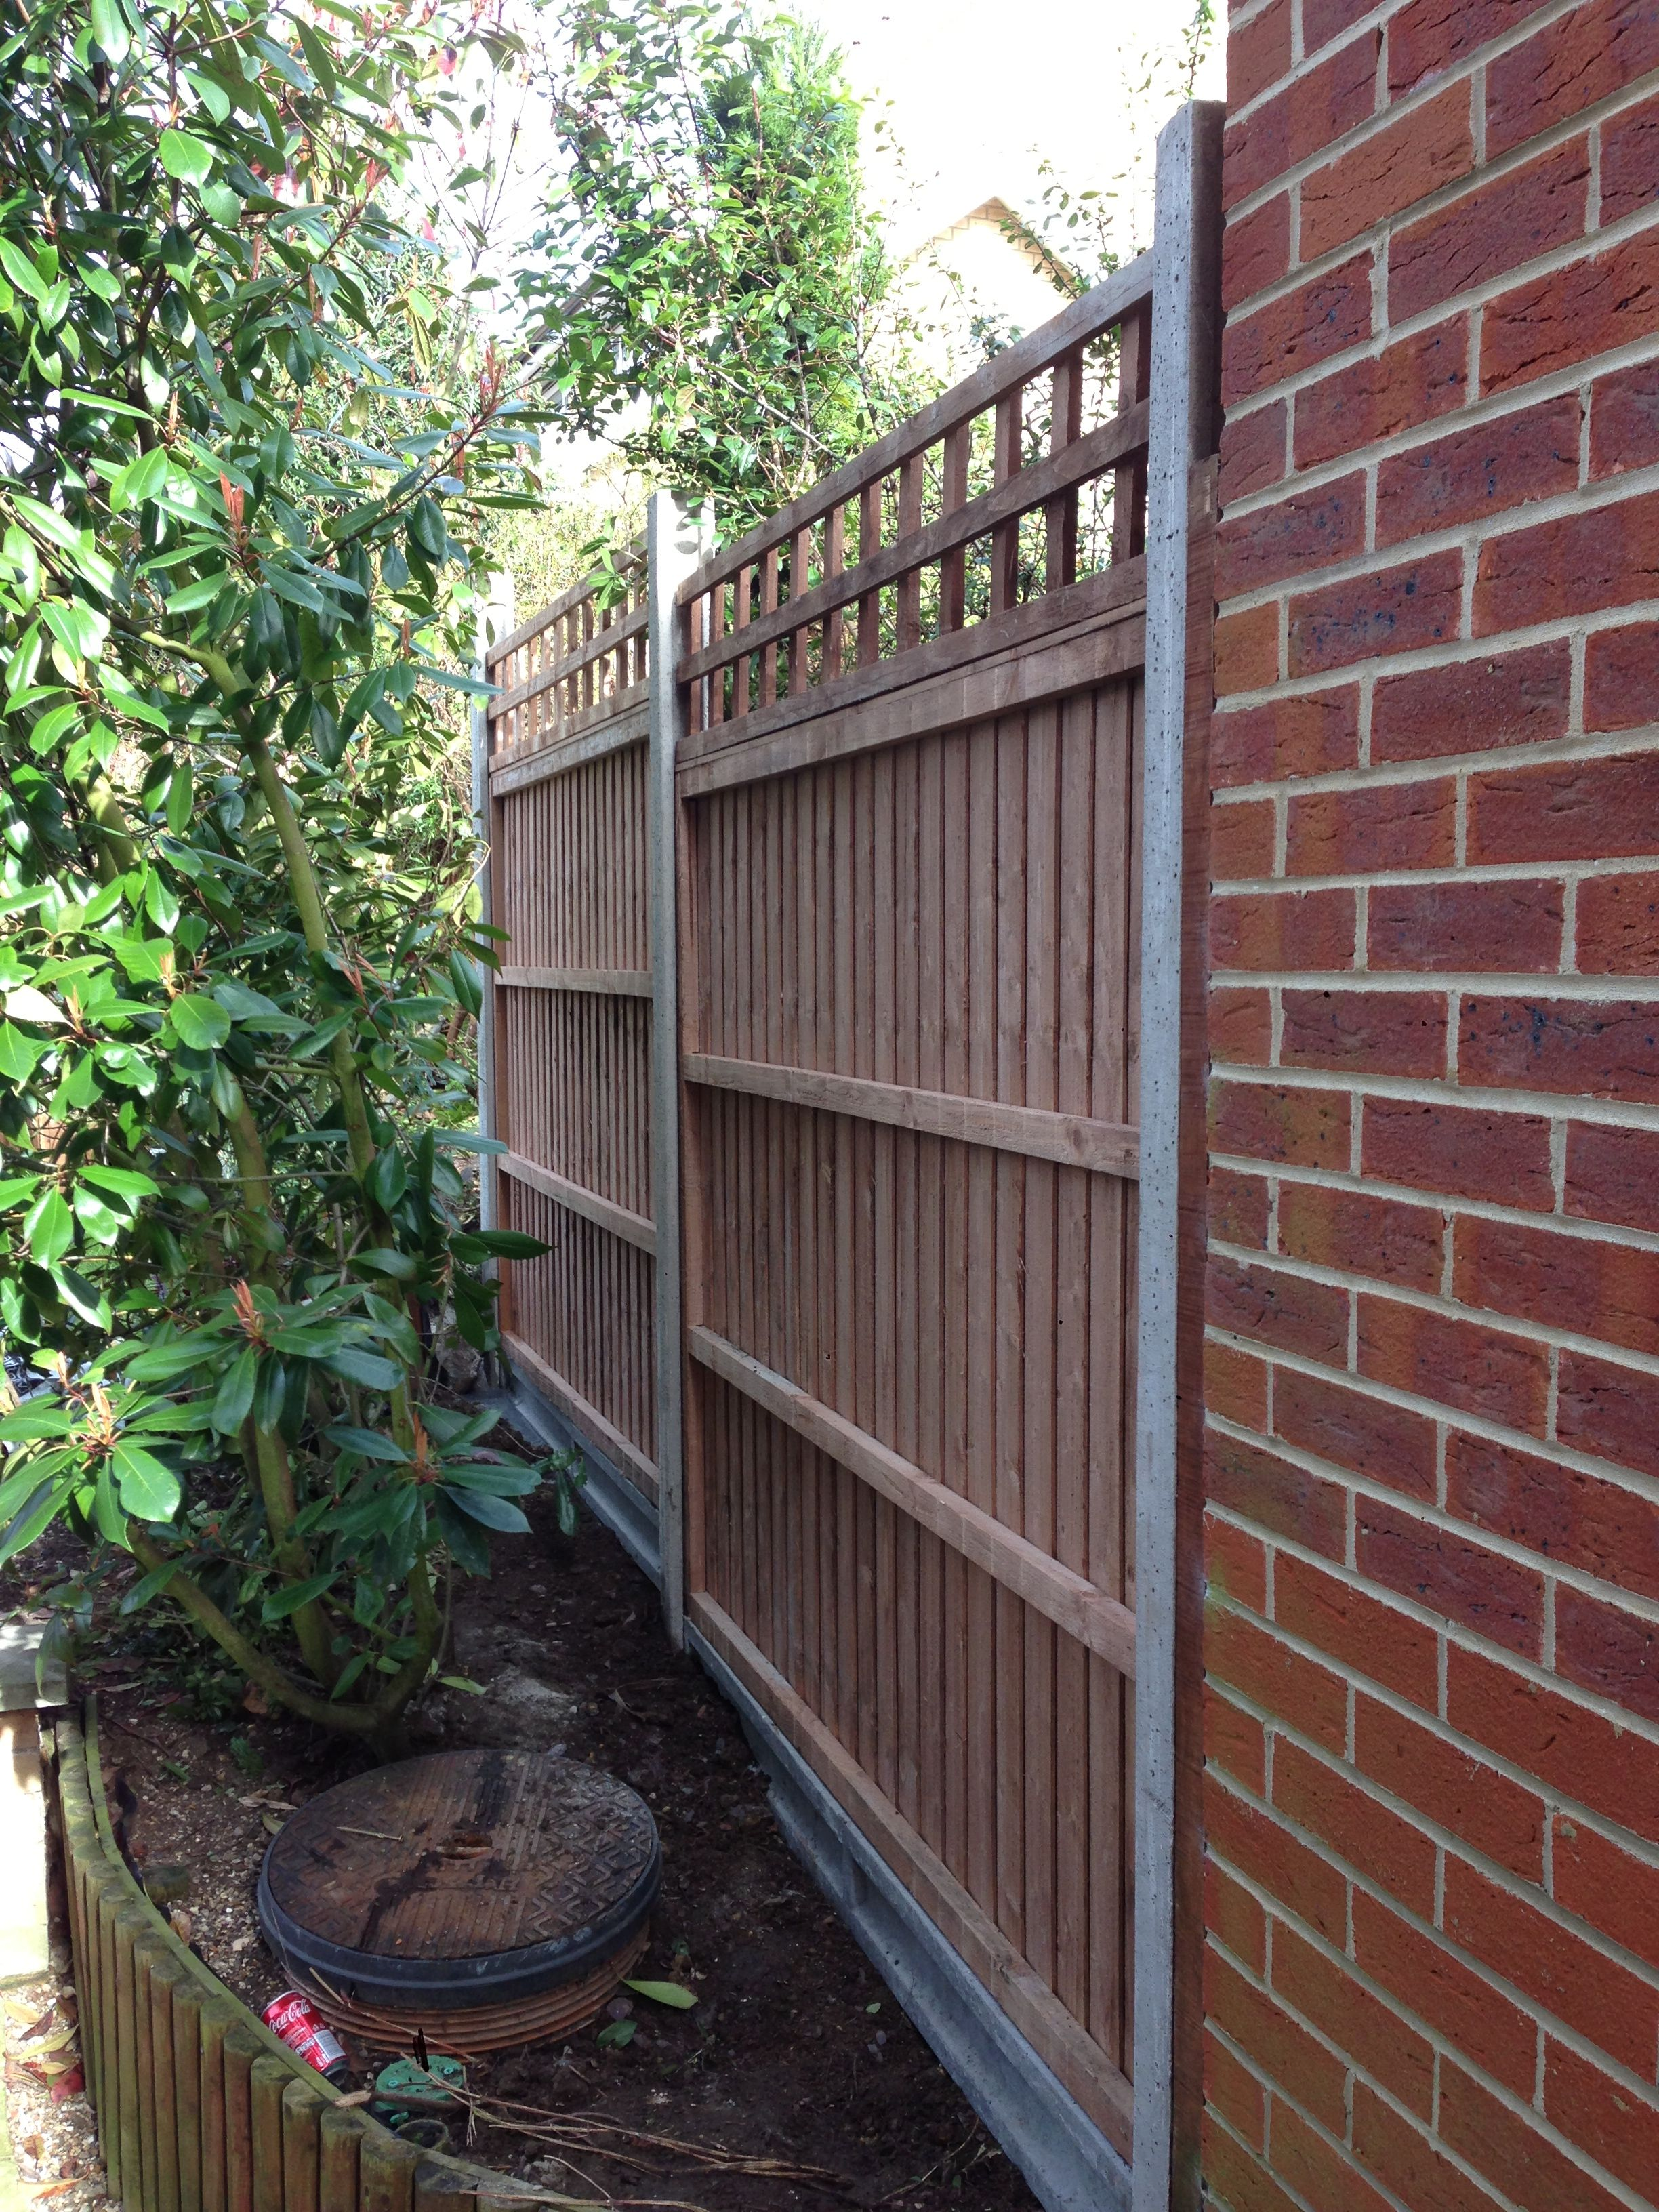 Garden Fence Wood With Lattice Top 503 760 7725 Garden Gates